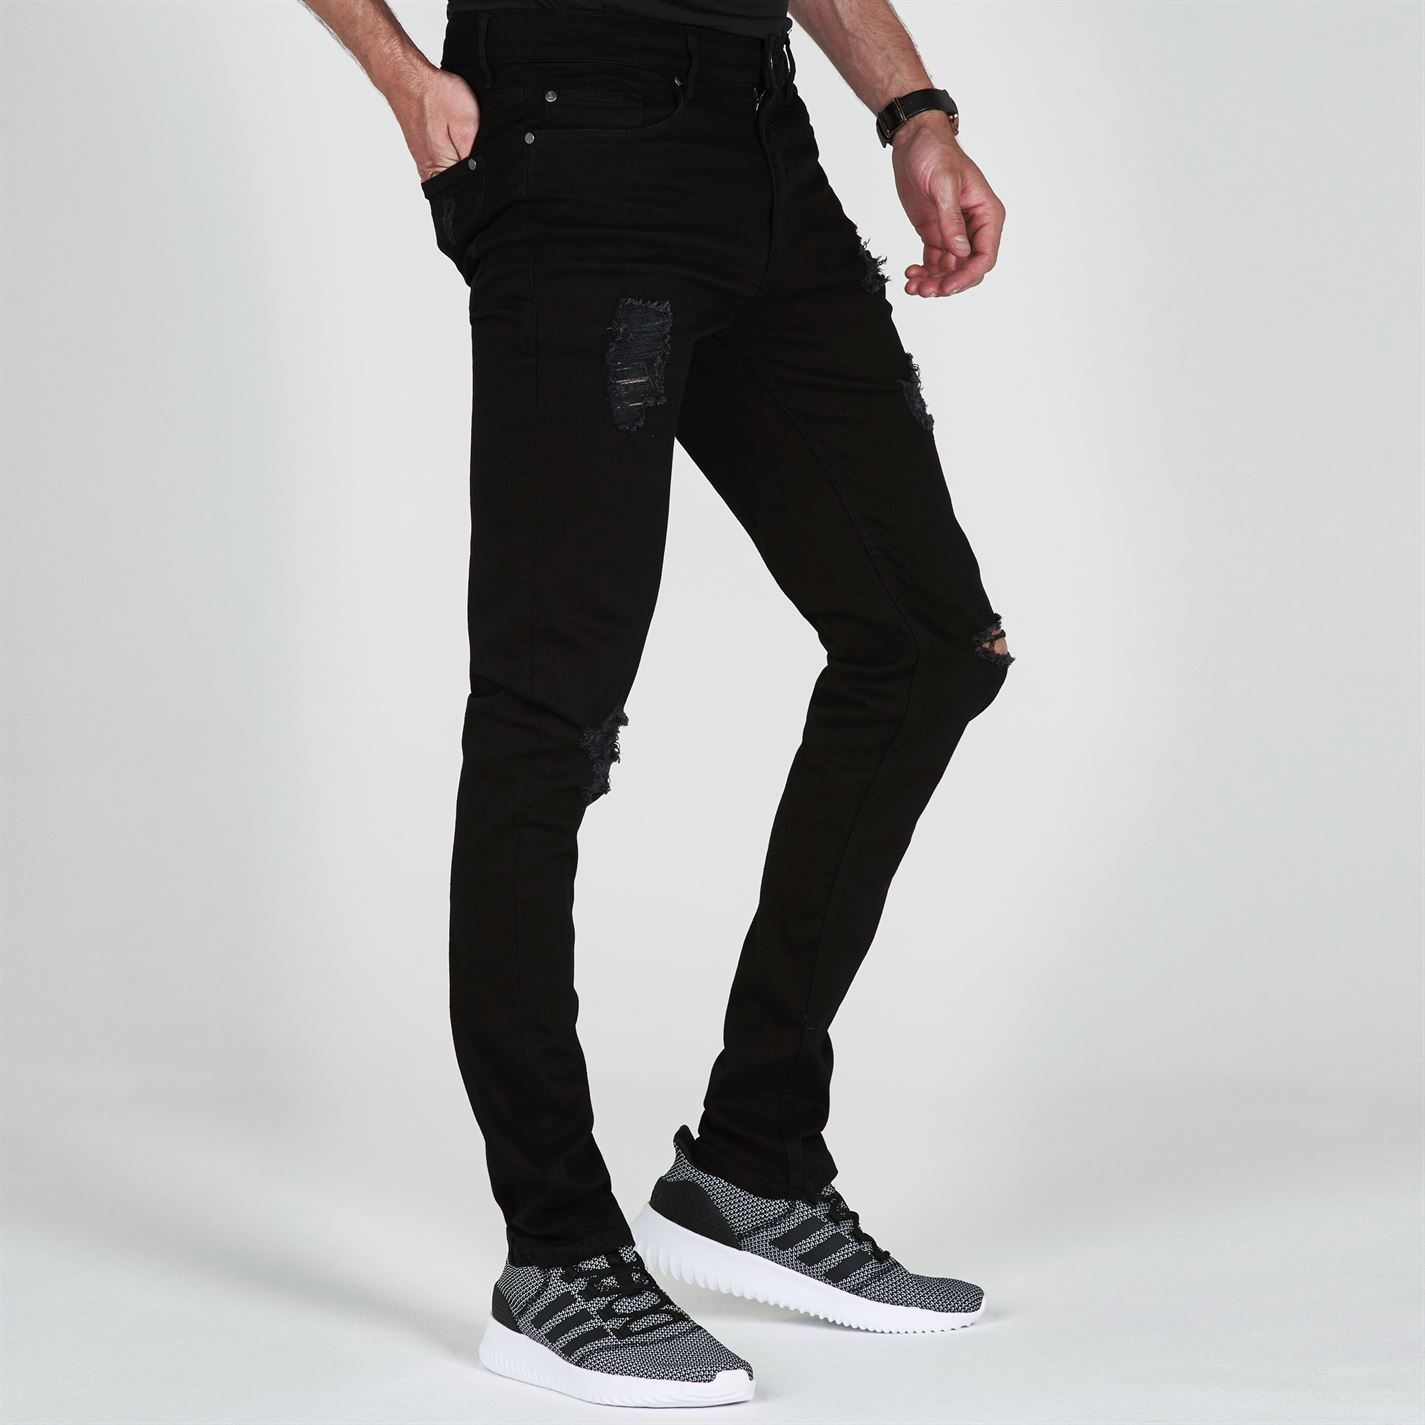 Jeans-Denim-Firetrap-Skinny-Mens-Trouser-Pants-Black thumbnail 8